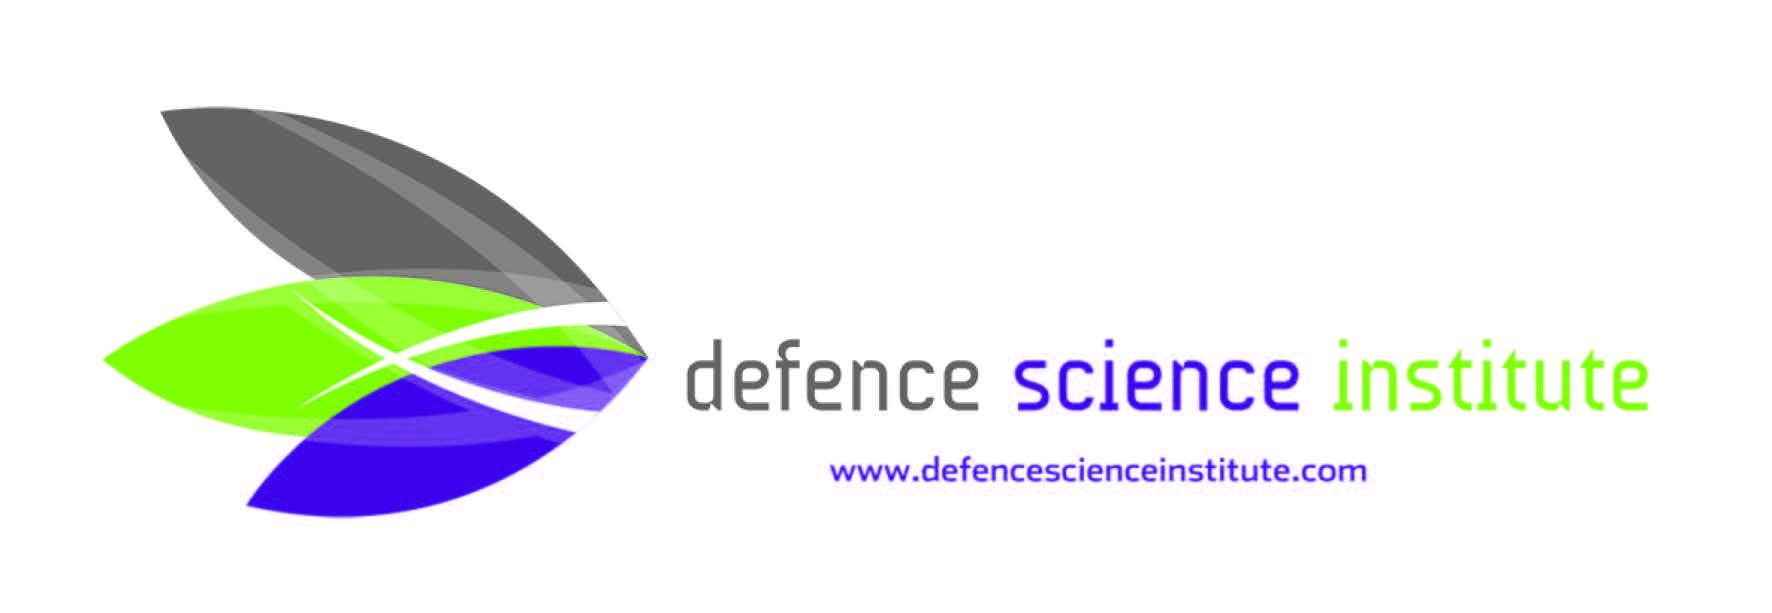 DSI logo higher resolution.jpg